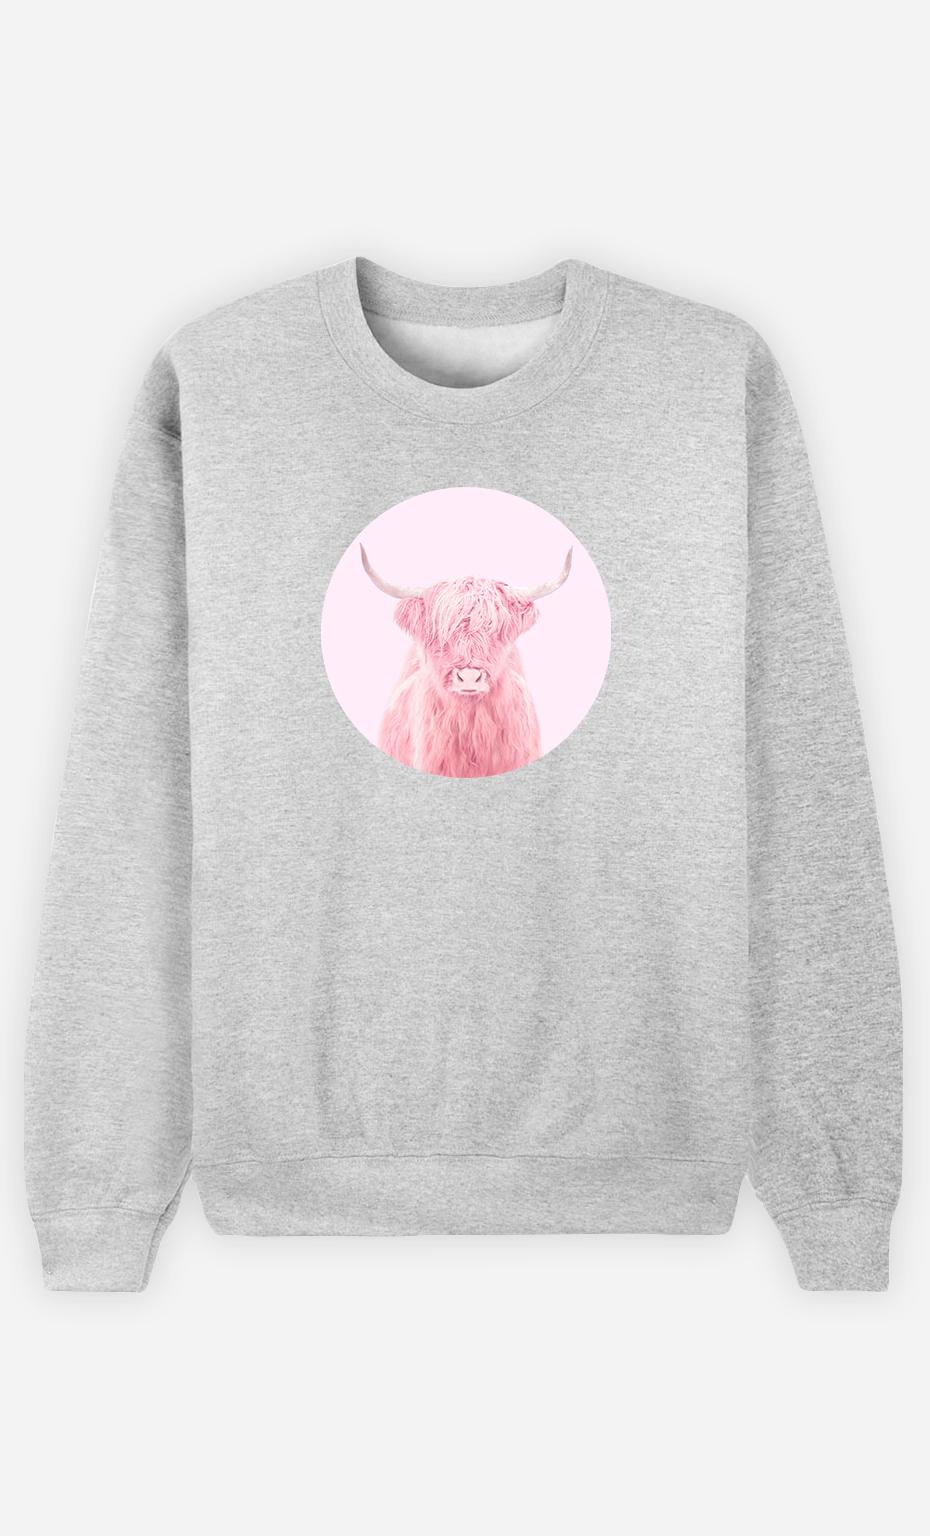 Sweatshirt Femme Highland Cow